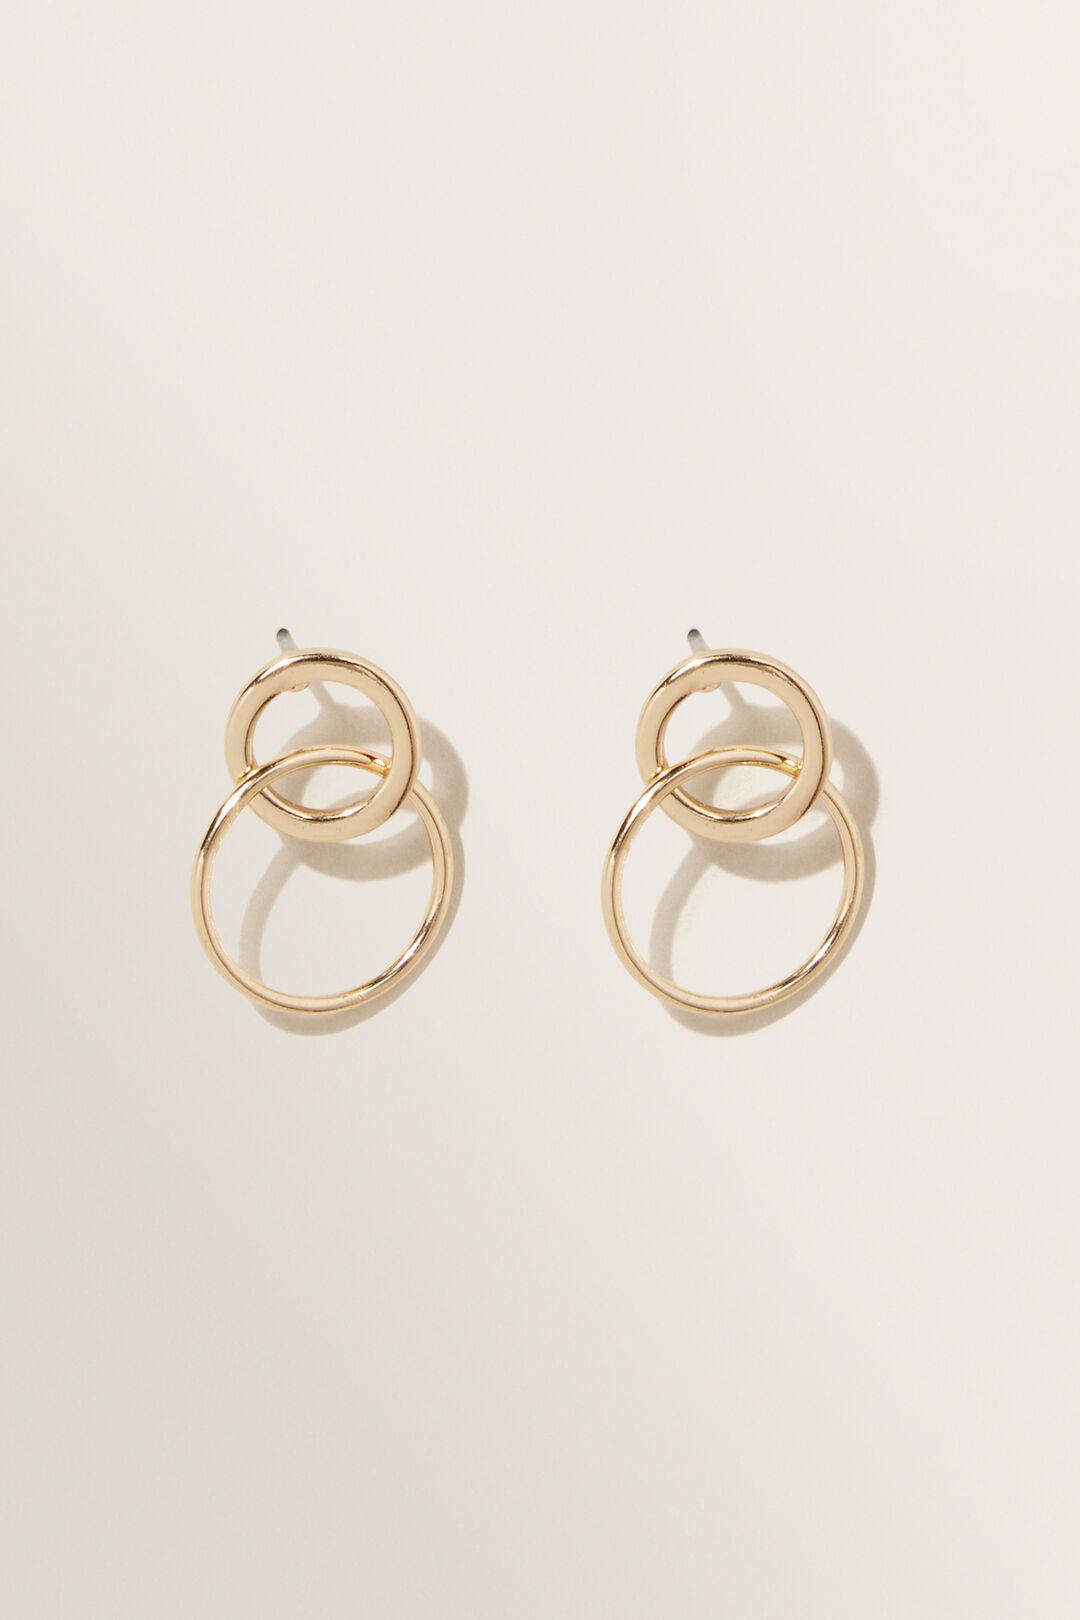 Linked Ring Earrings  GOLD  hi-res